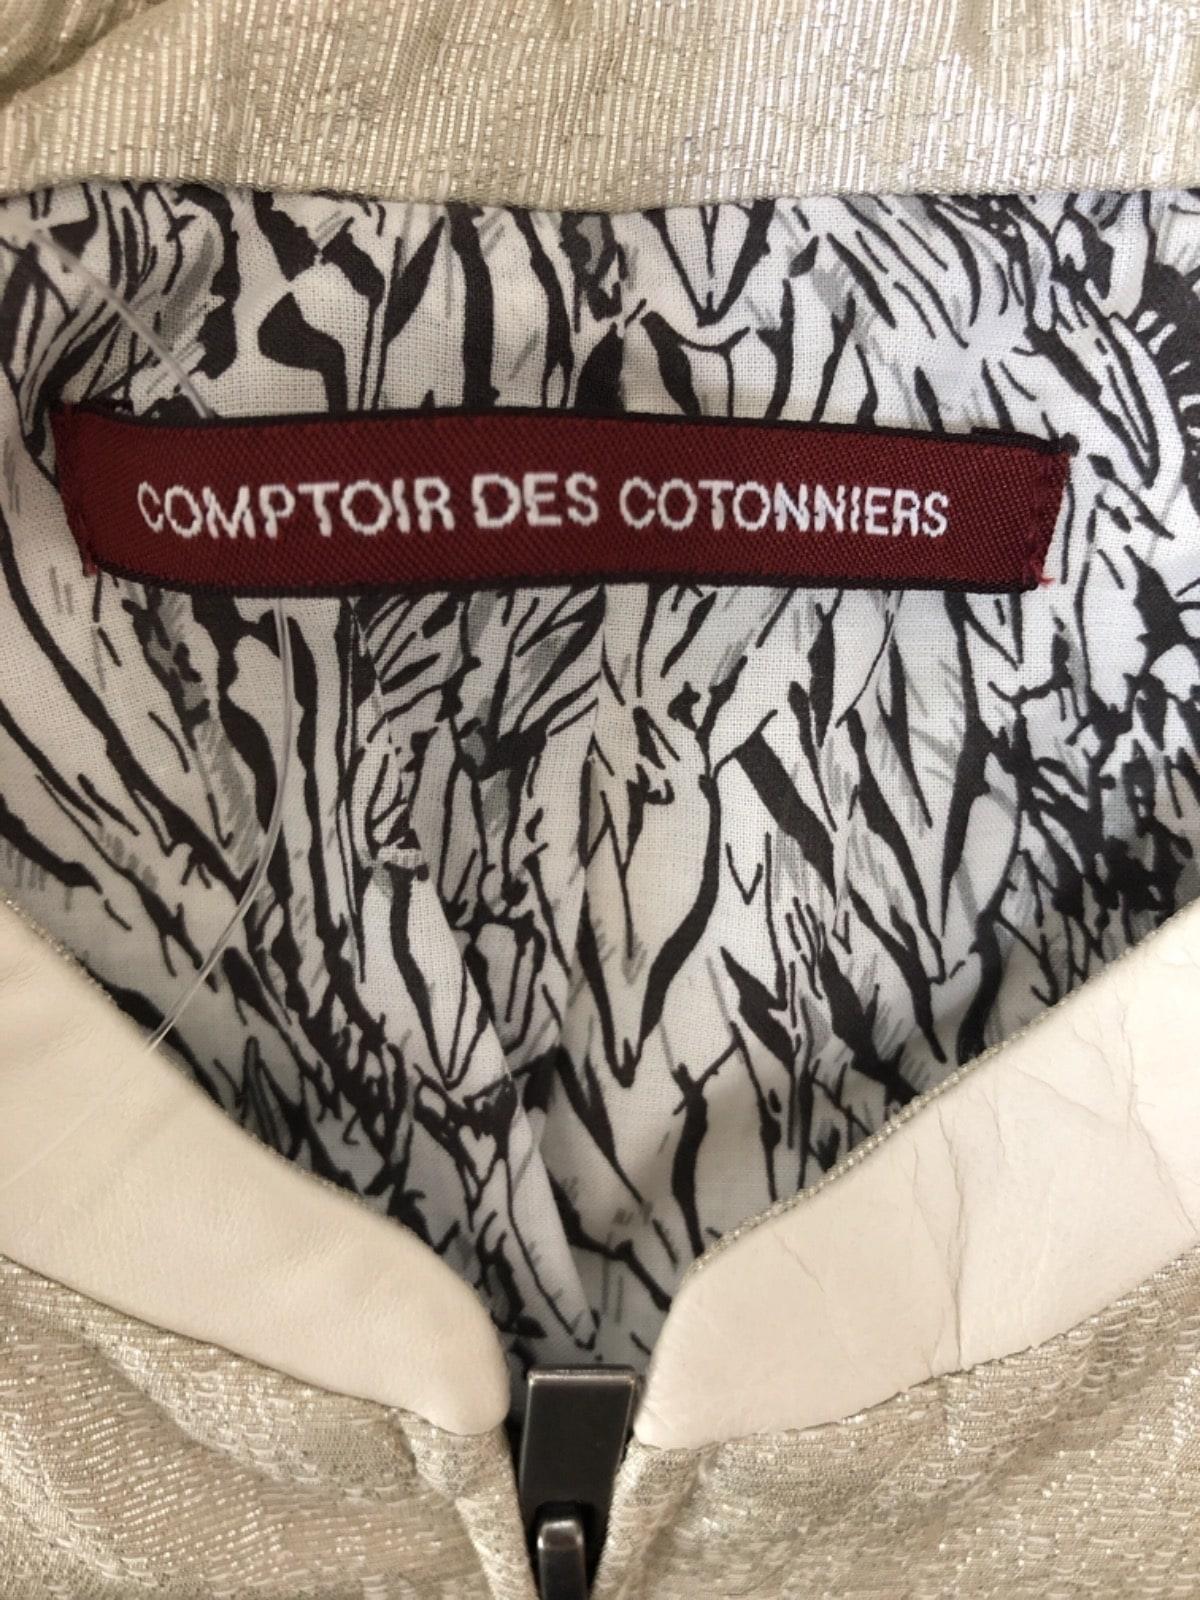 COMPTOIR DES COTONNIERS(コントワーデコトニエ)のブルゾン